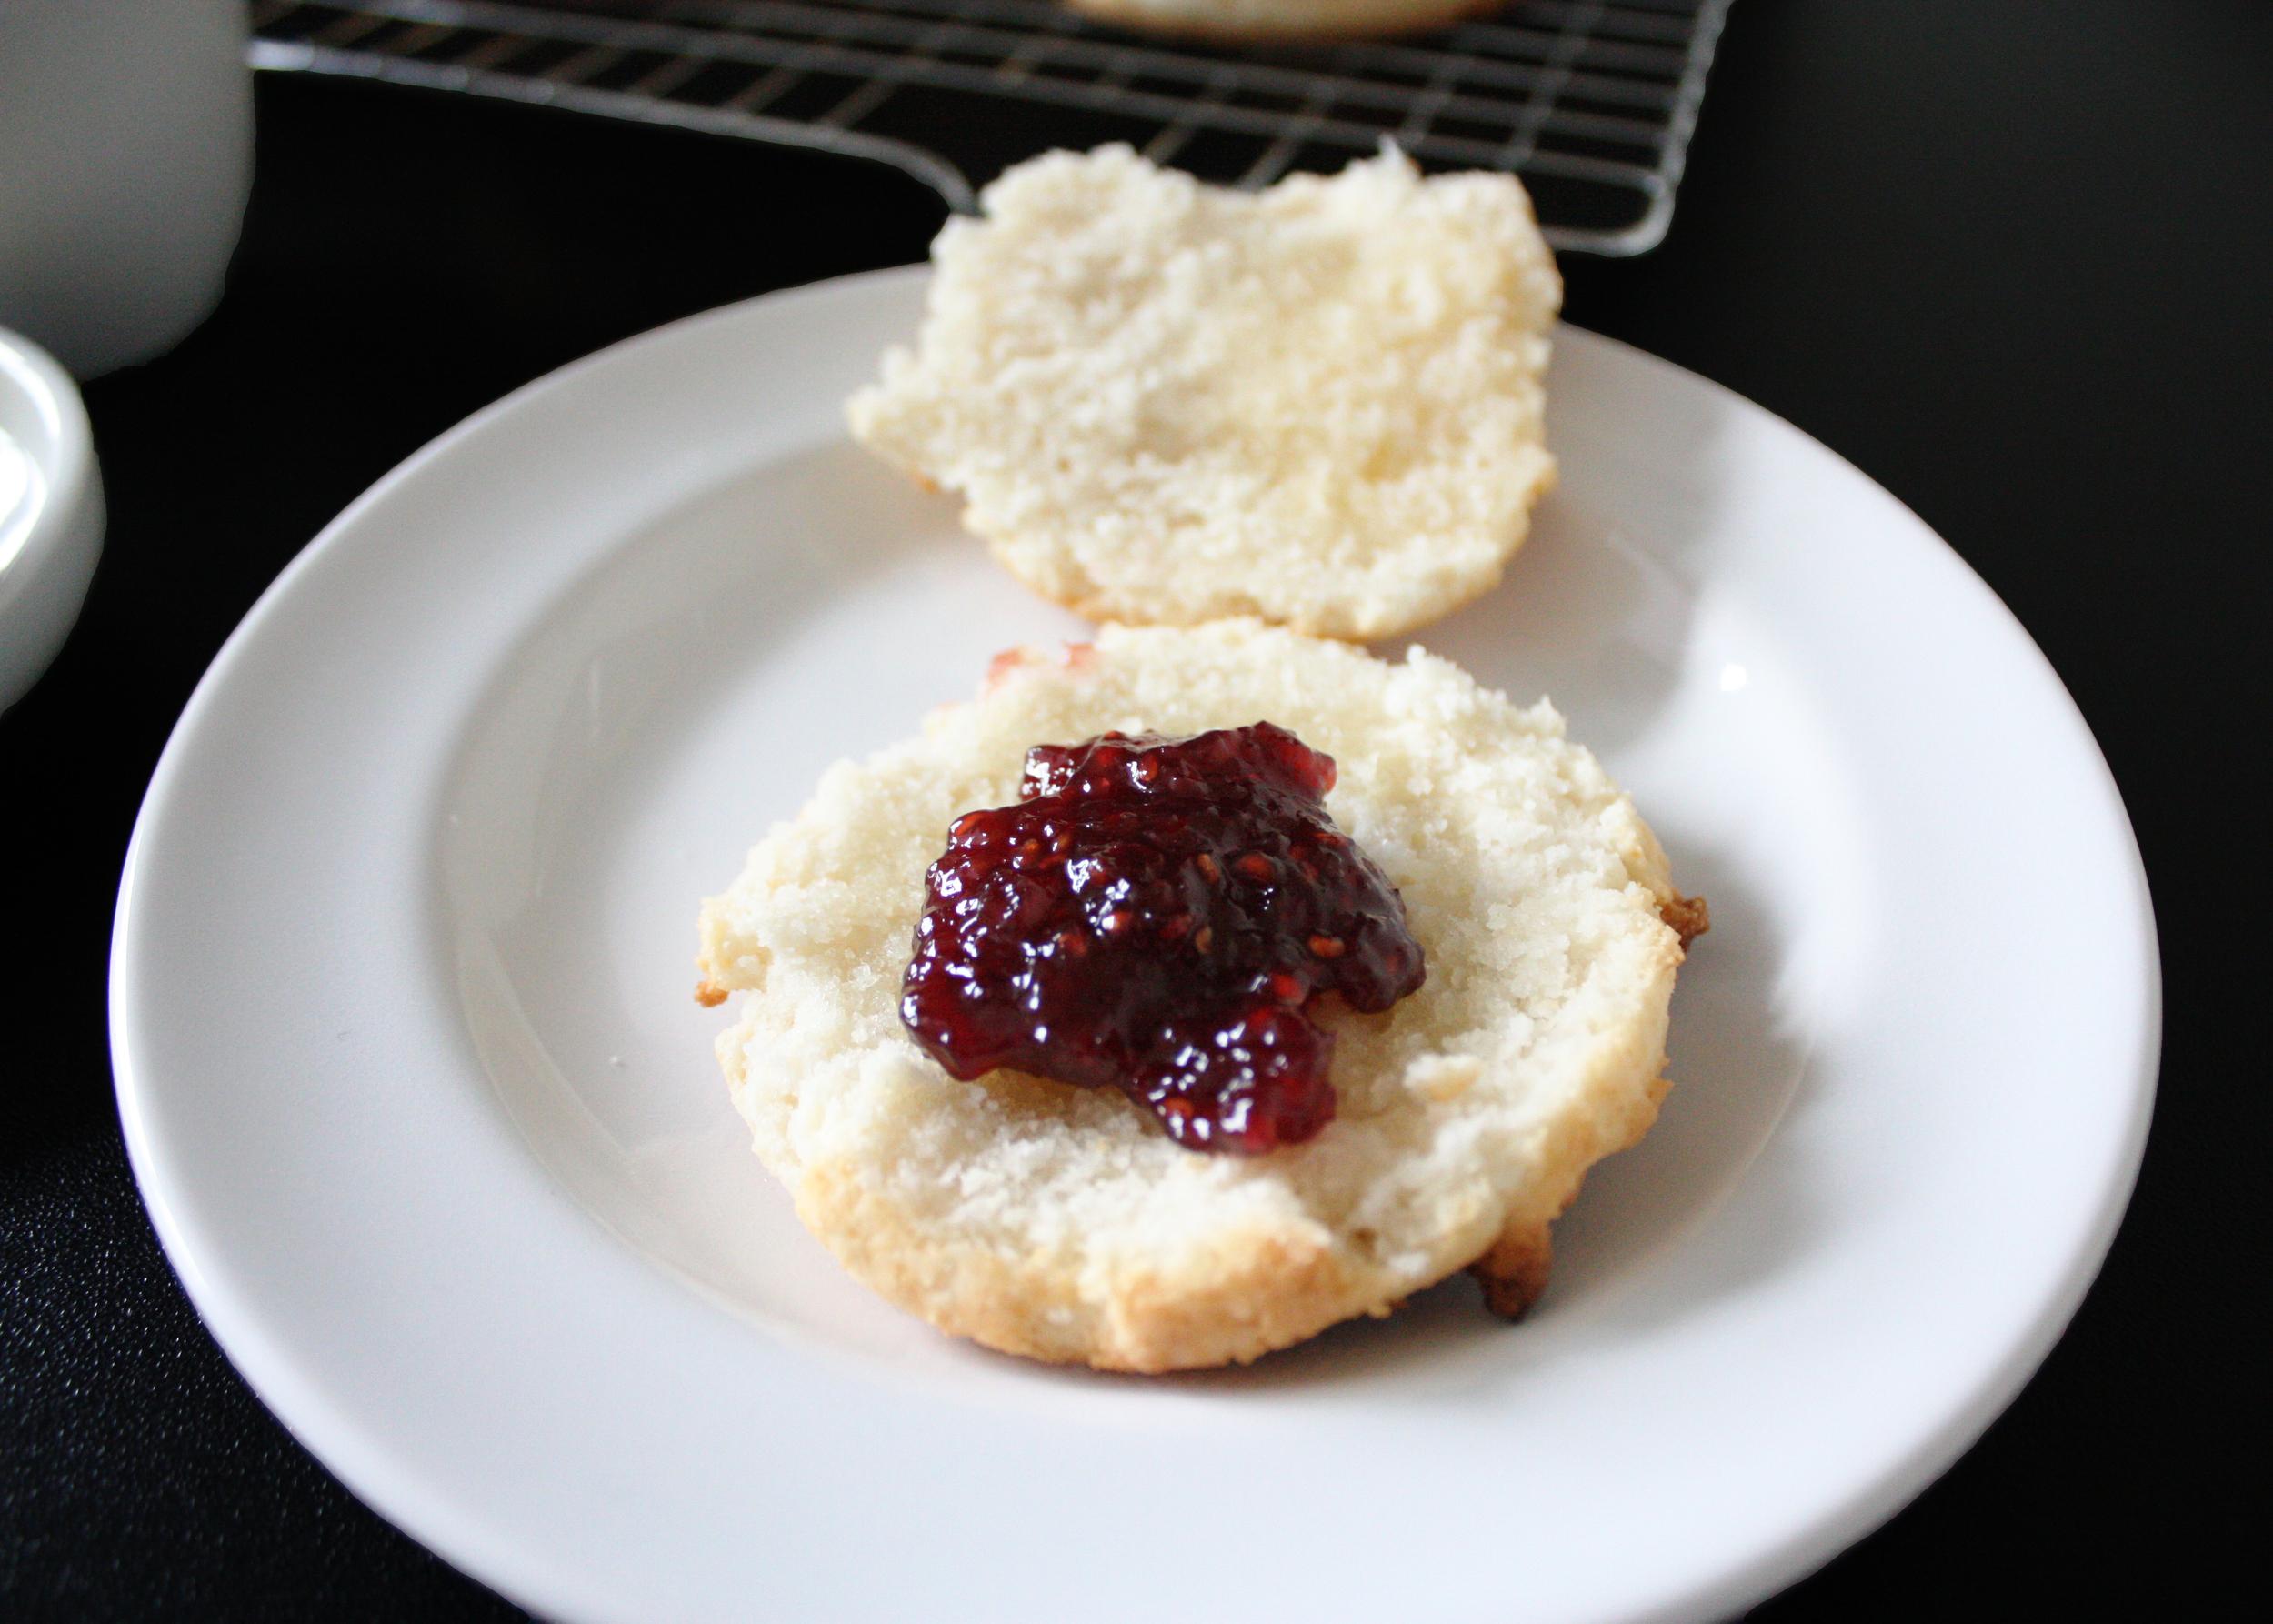 sam-c-perry-gluten-free-biscuits-jam-top.jpg